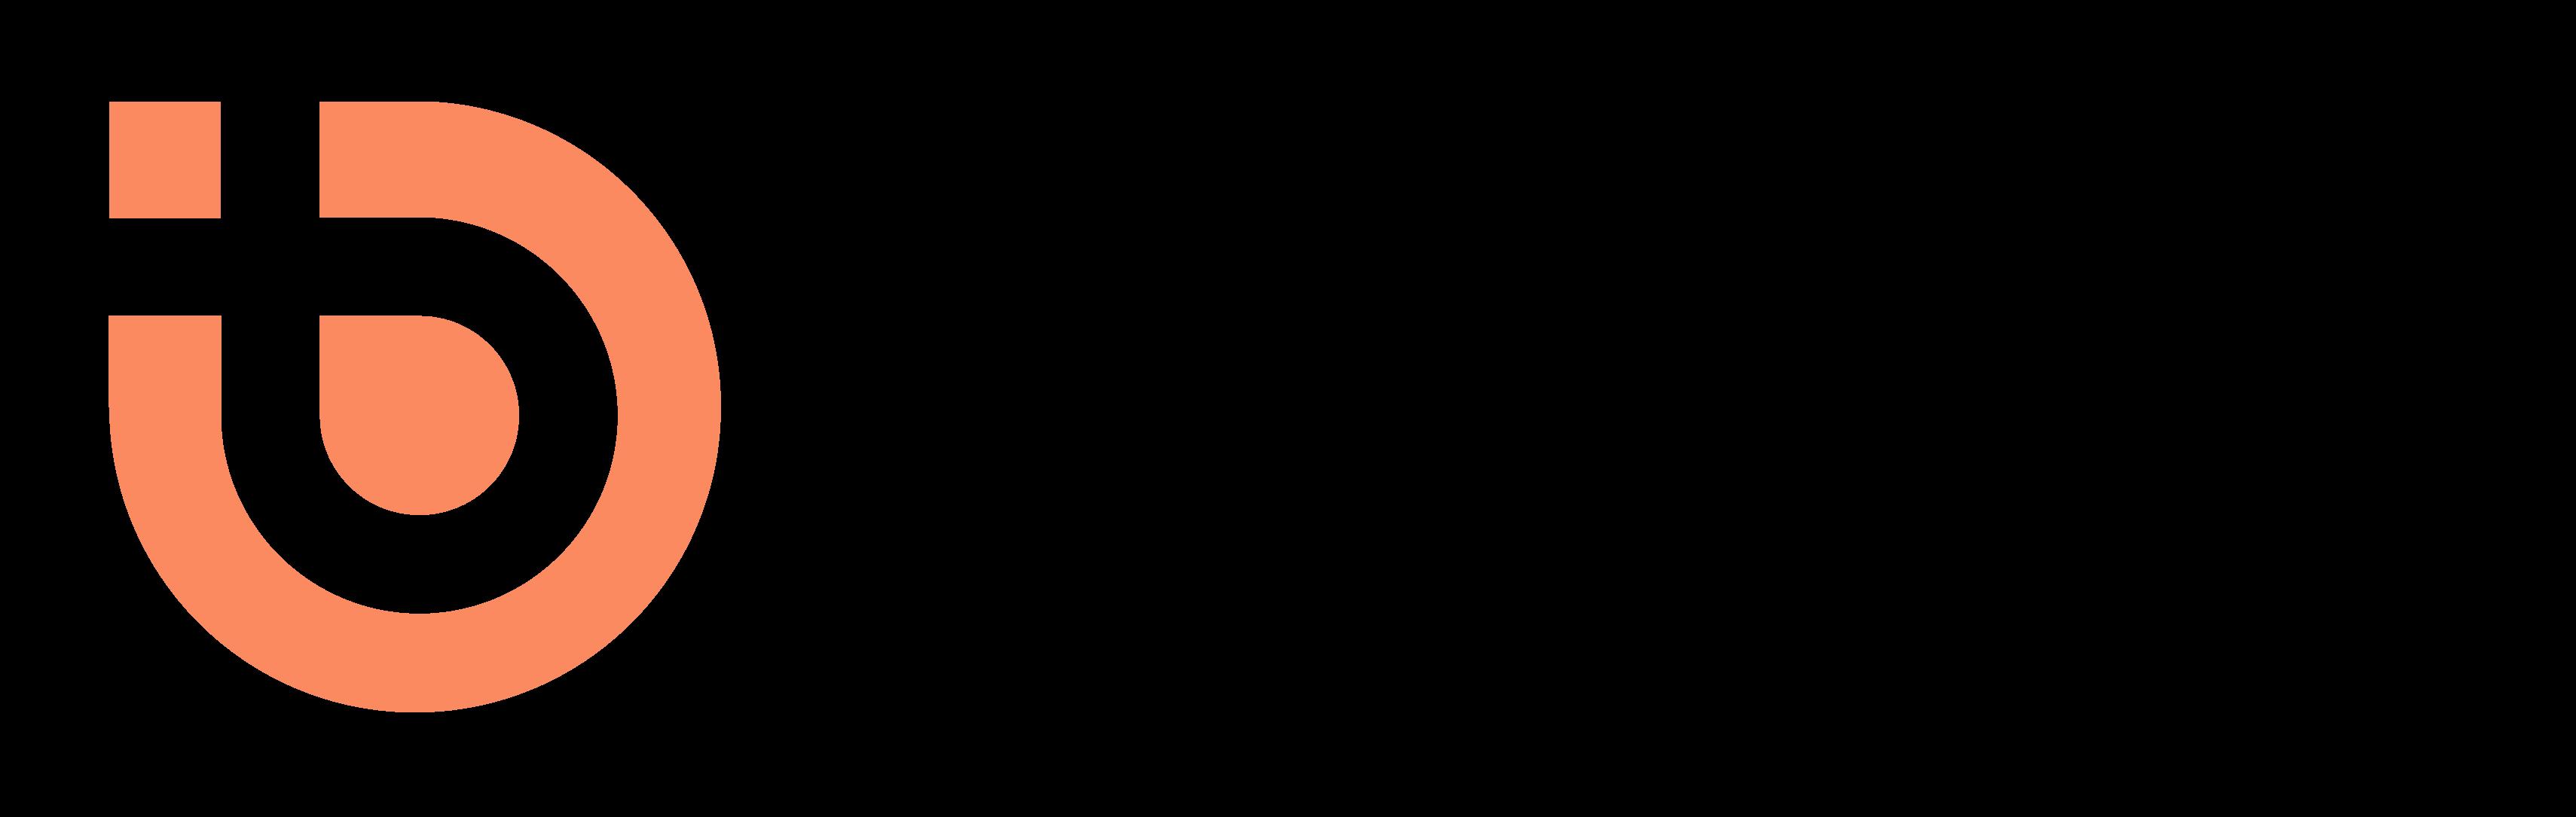 BrightID logo for homepage